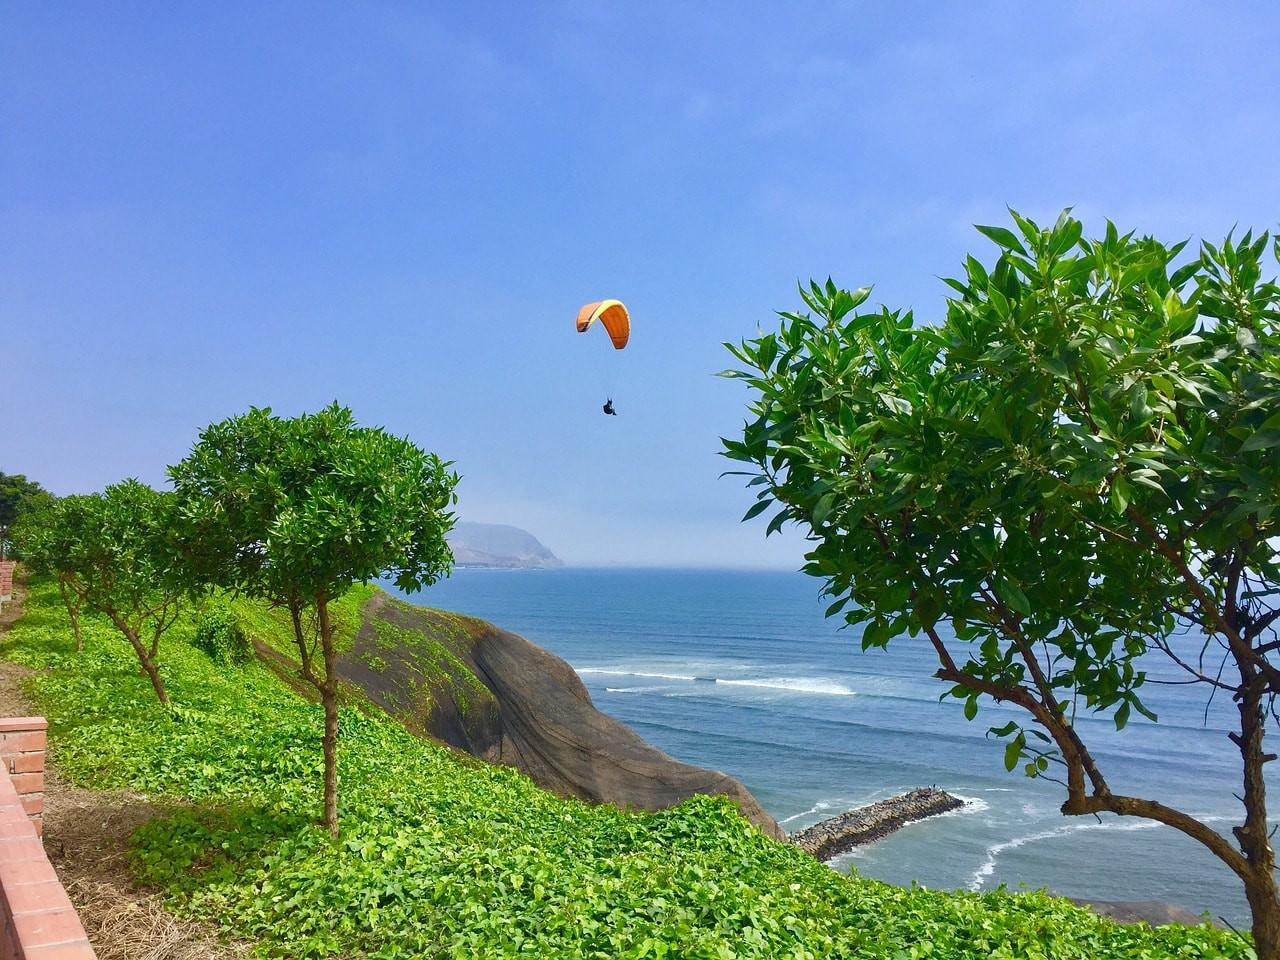 © Pixabay https://pixabay.com/en/lima-peru-paragliding-miraflores-1965785/